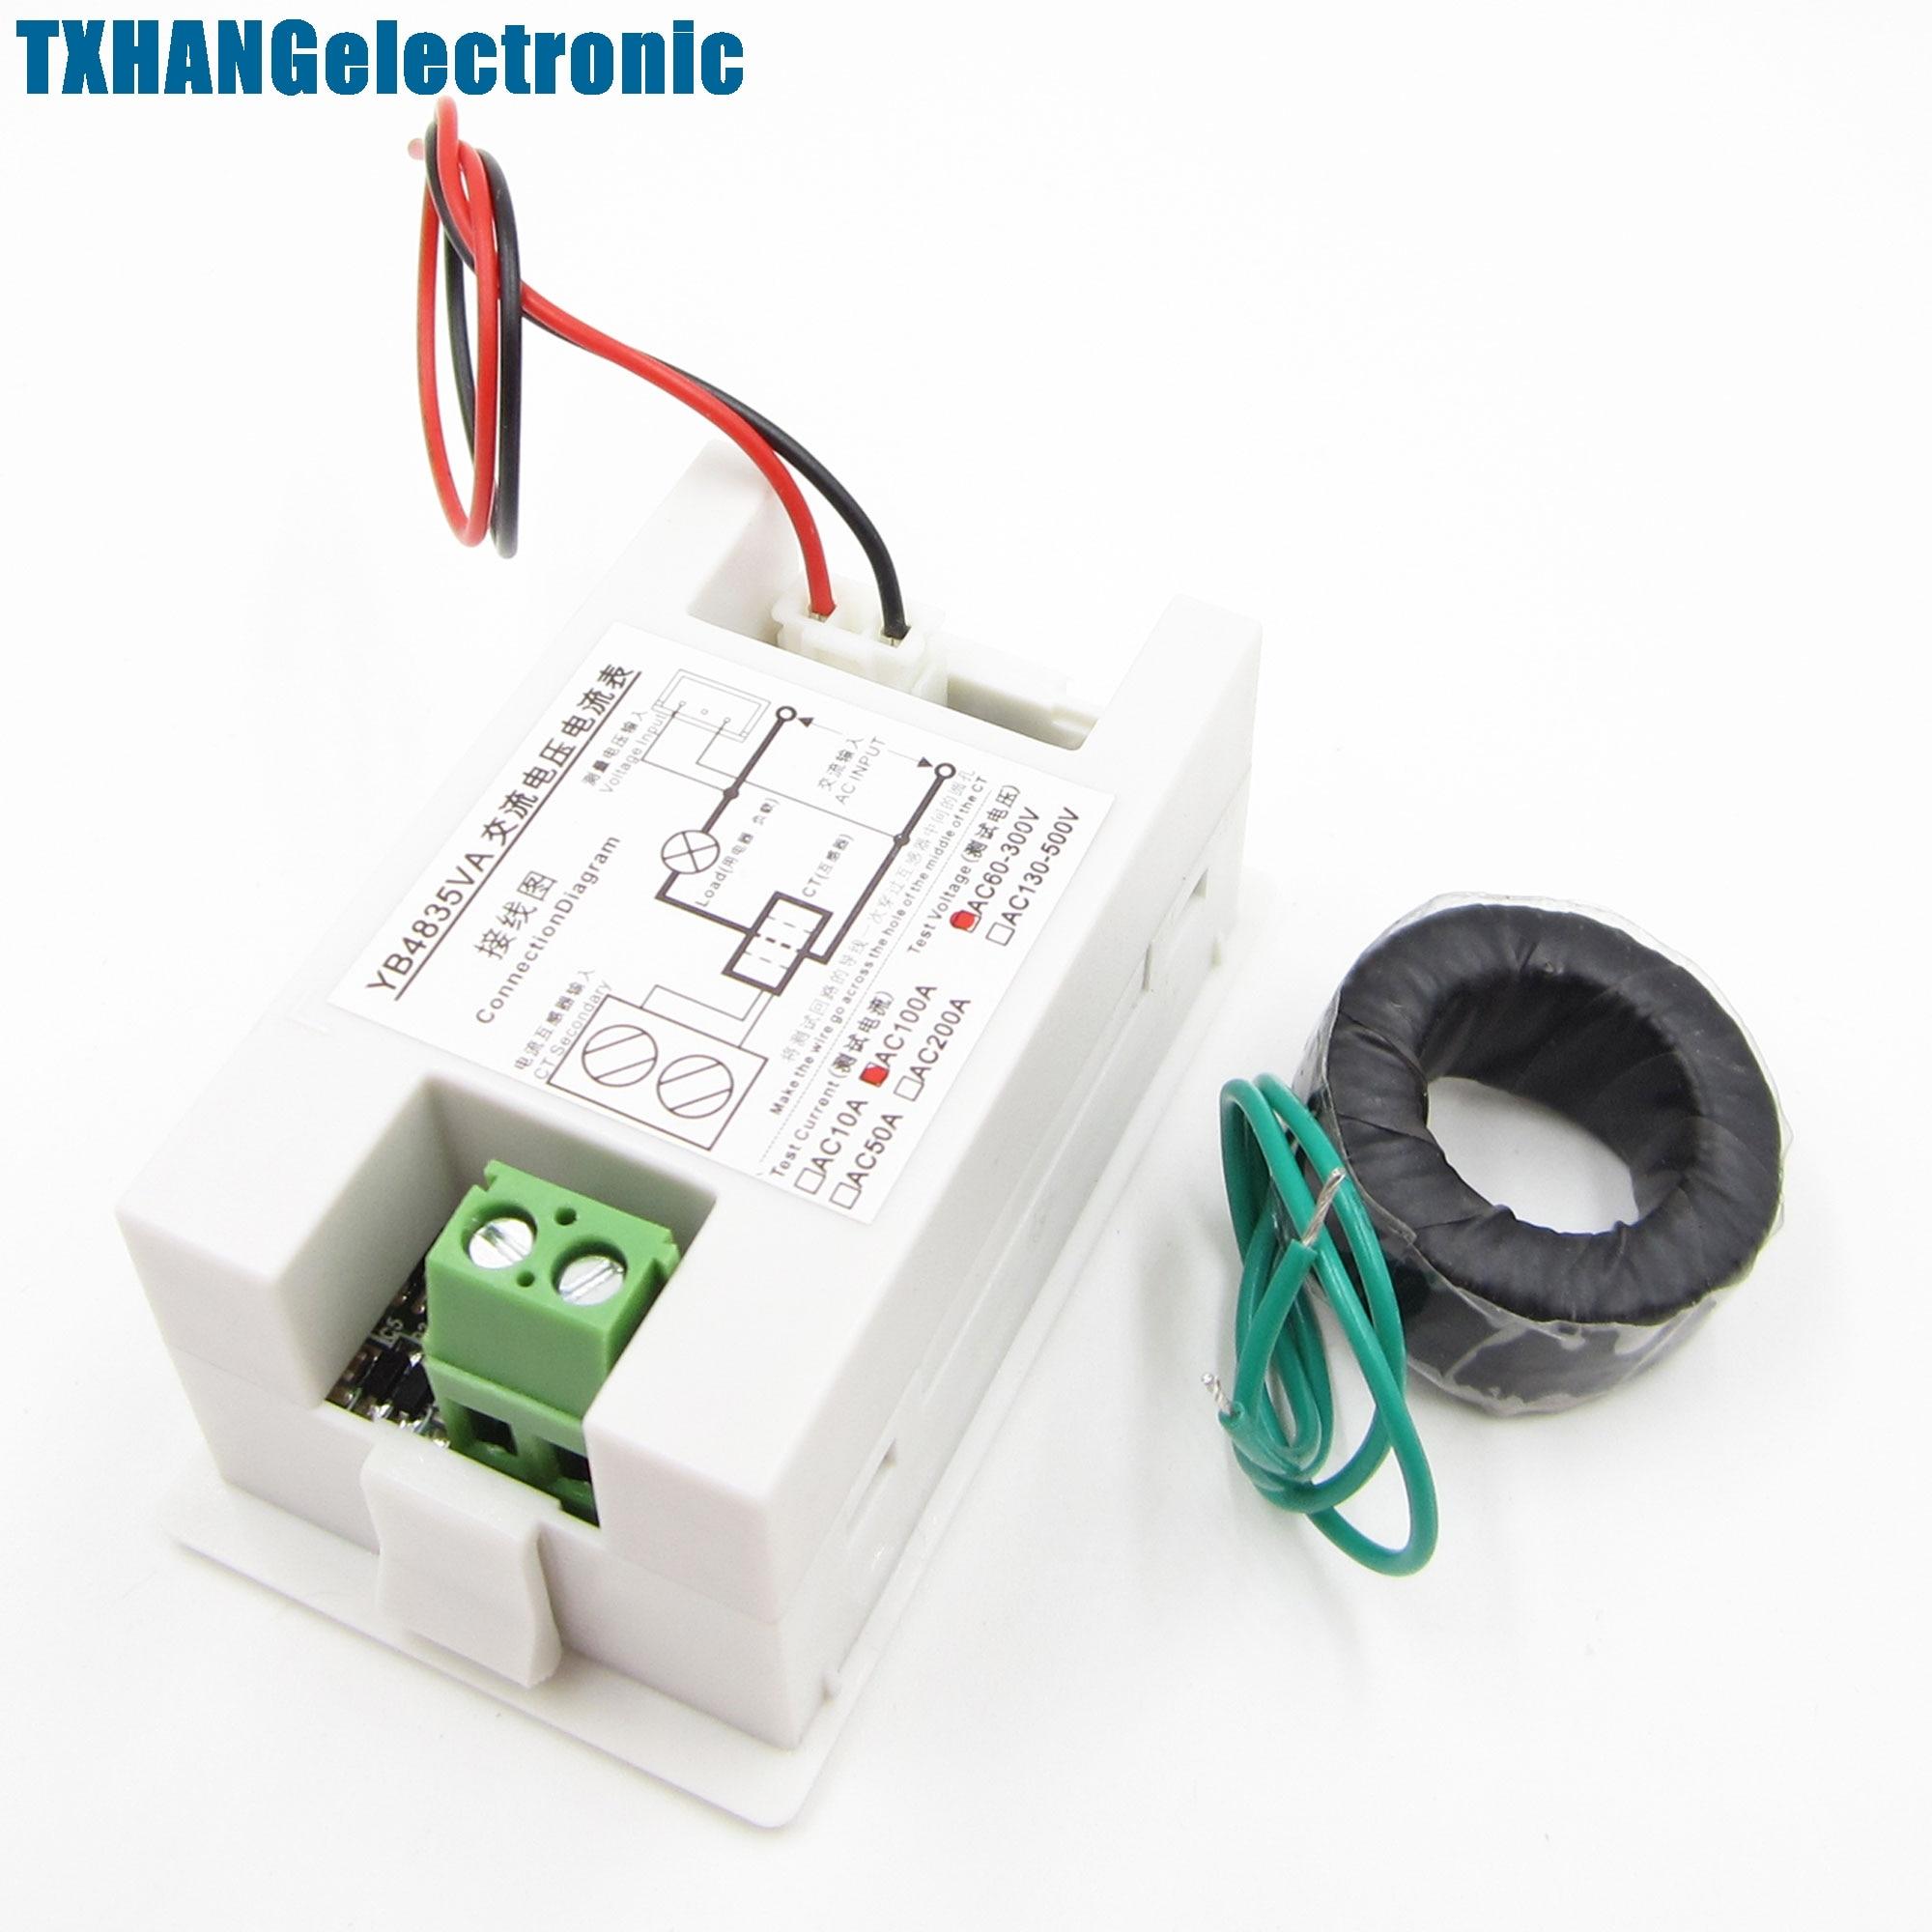 Njk 5002c Hall Effect Sensor Proximity Switch Npn 3 Wires Normally Volt Meter Wiring Diagram On For Digital Ammeter Voltmeter Lcd Panel Amp Ac 100a 300v 110v 220v White